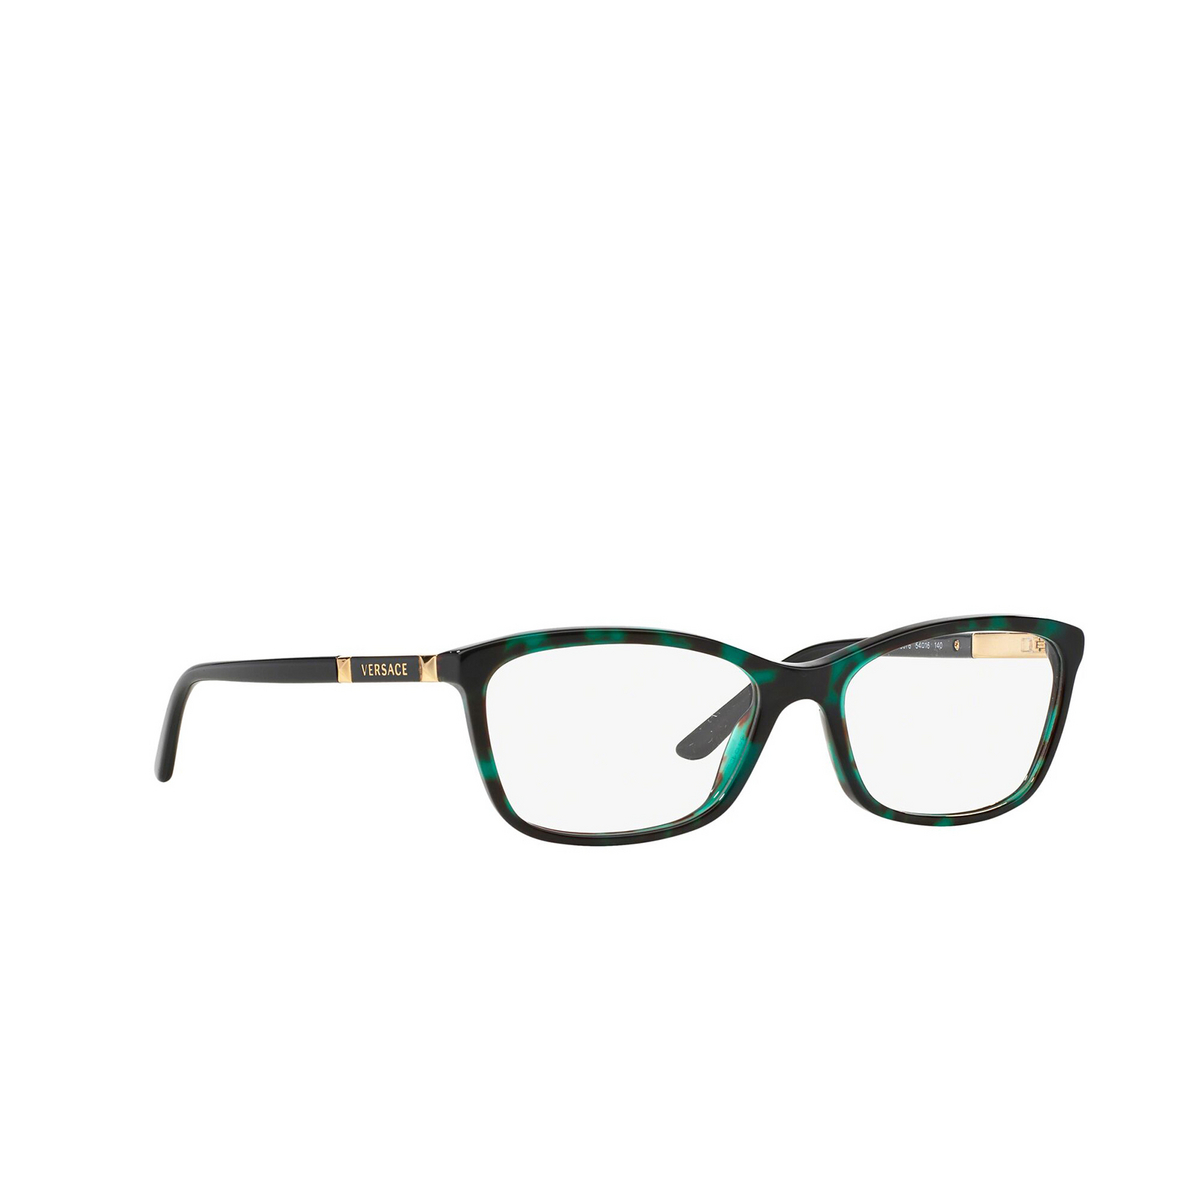 Versace® Butterfly Eyeglasses: VE3186 color Havana 5076 - three-quarters view.